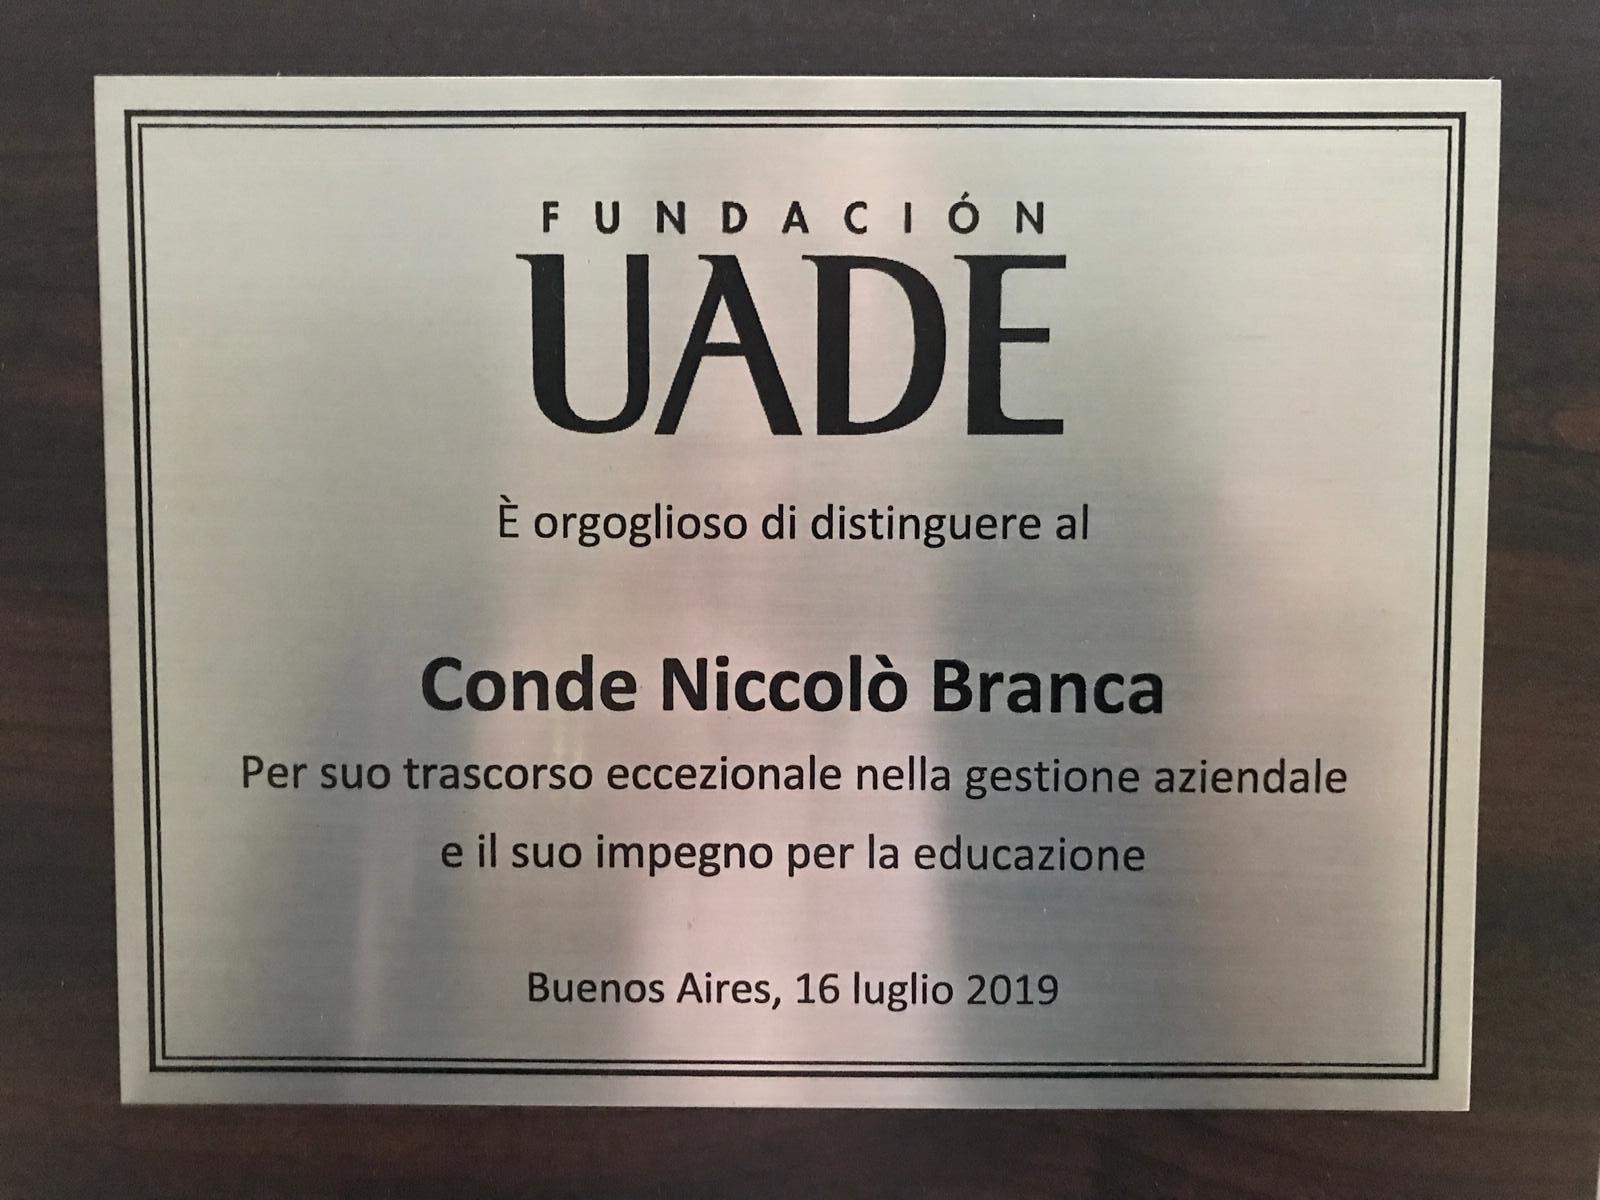 Buenos Aires incontro alla UADE